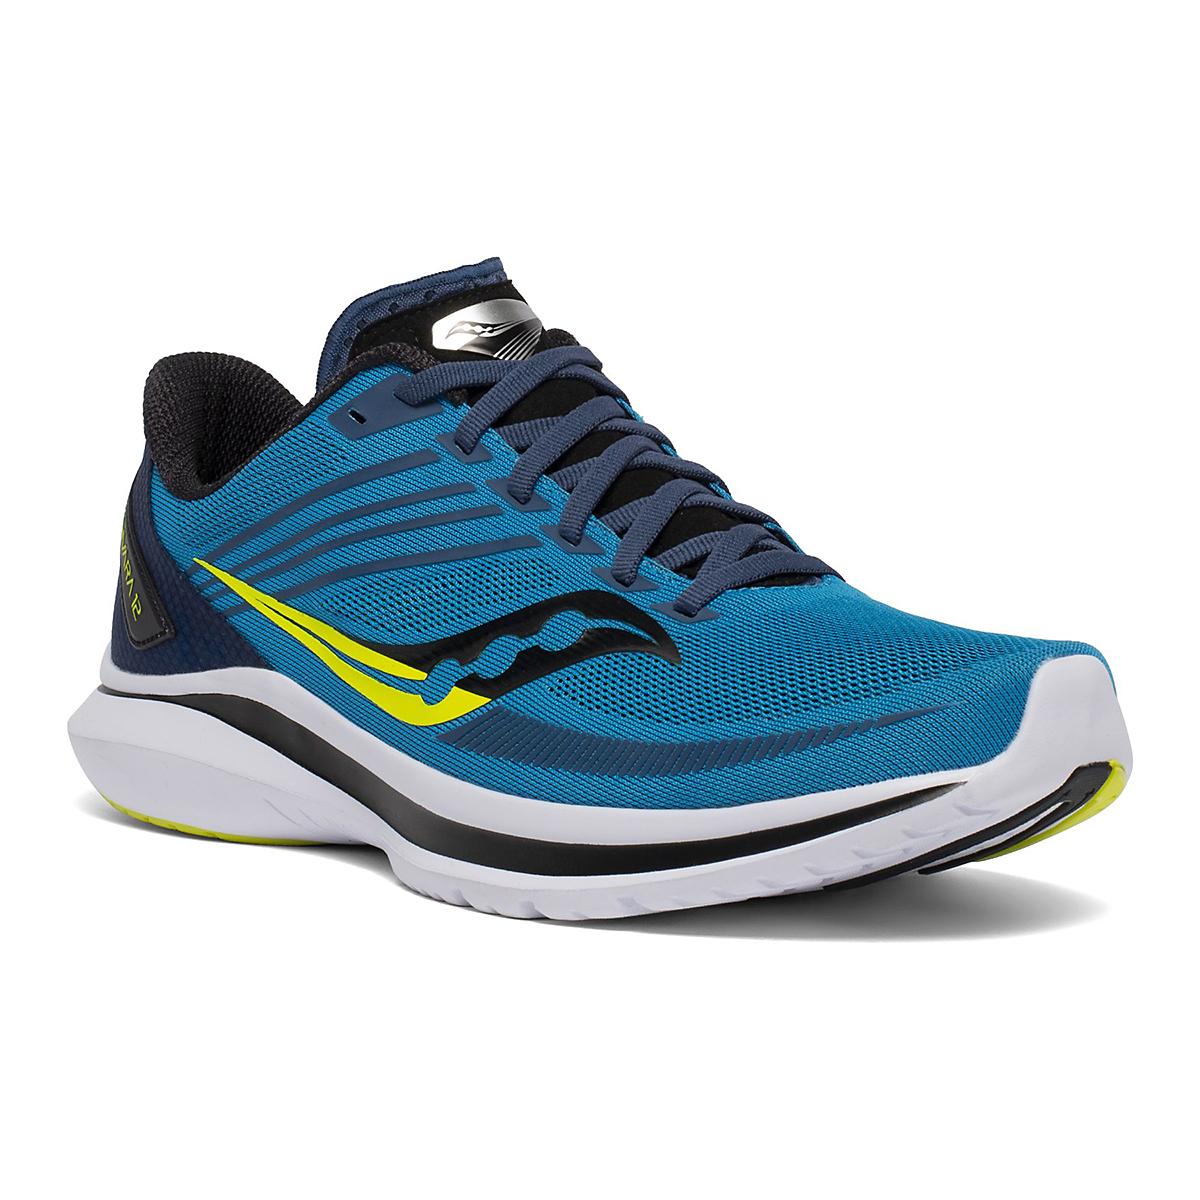 Men's Saucony Kinvara 12 Running Shoe - Color: Cobalt/Citrus - Size: 7 - Width: Regular, Cobalt/Citrus, large, image 5